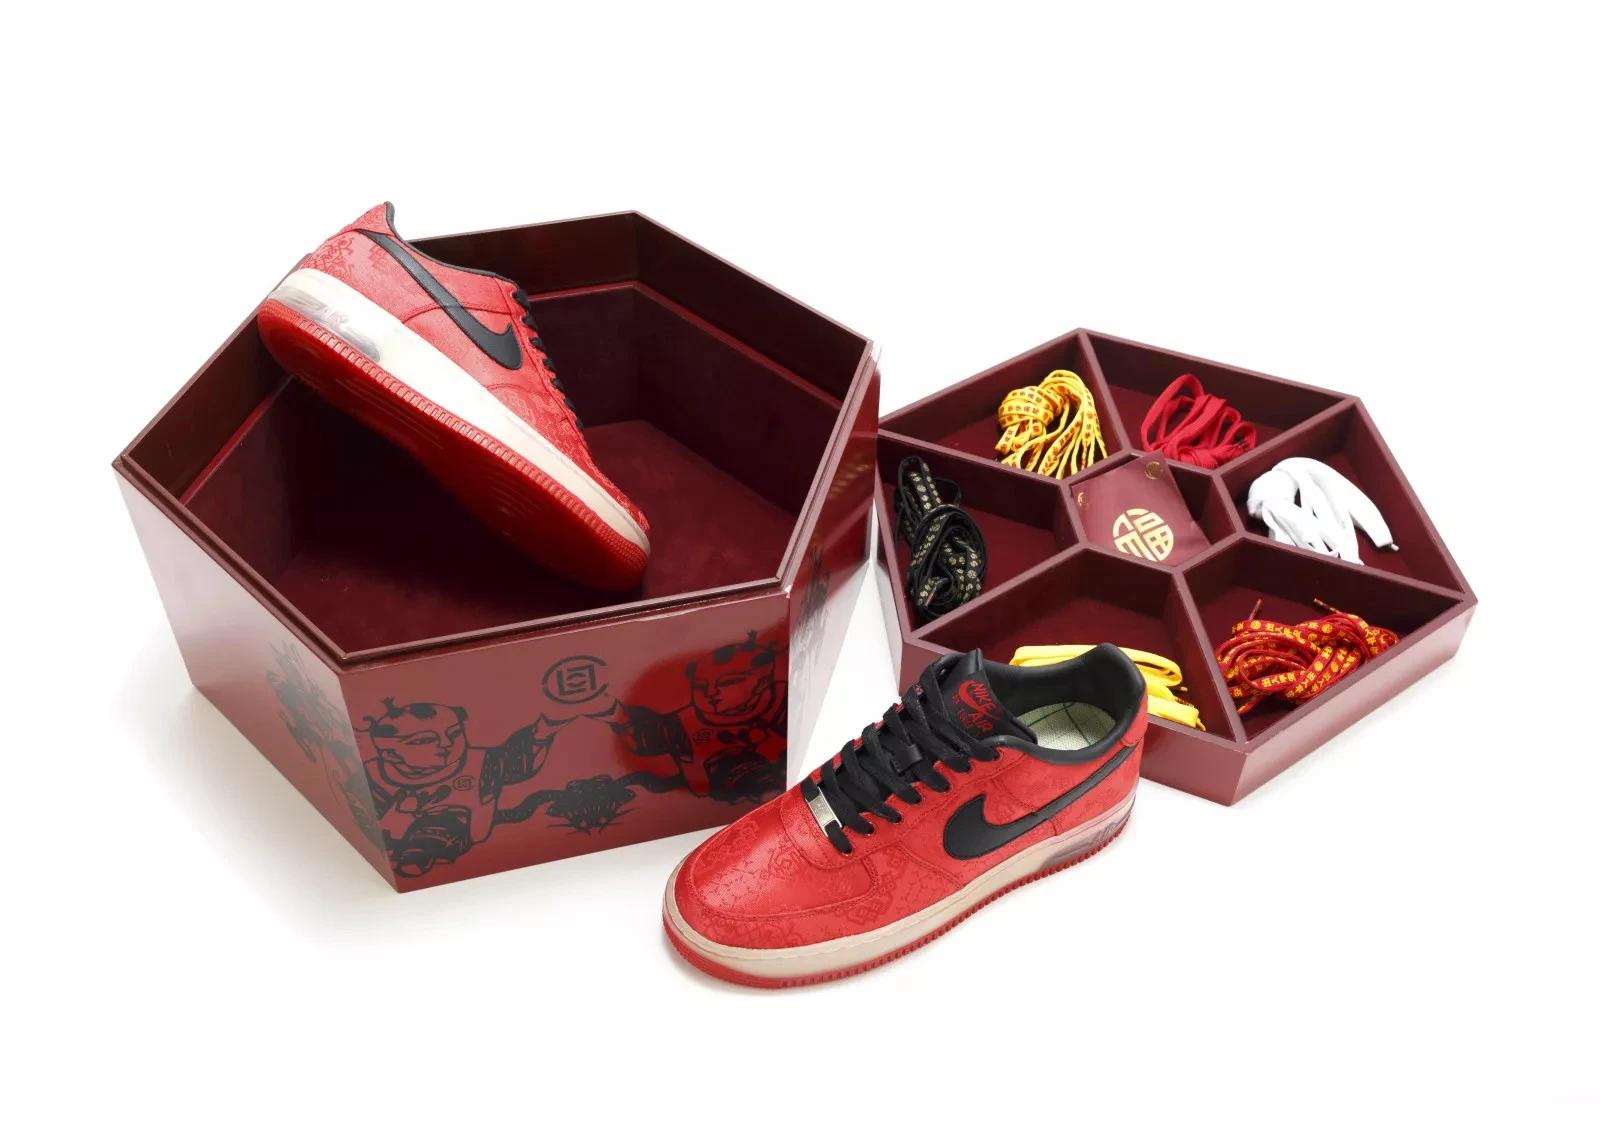 CLOT x Nike '1WORLD' Air Force 1 special box